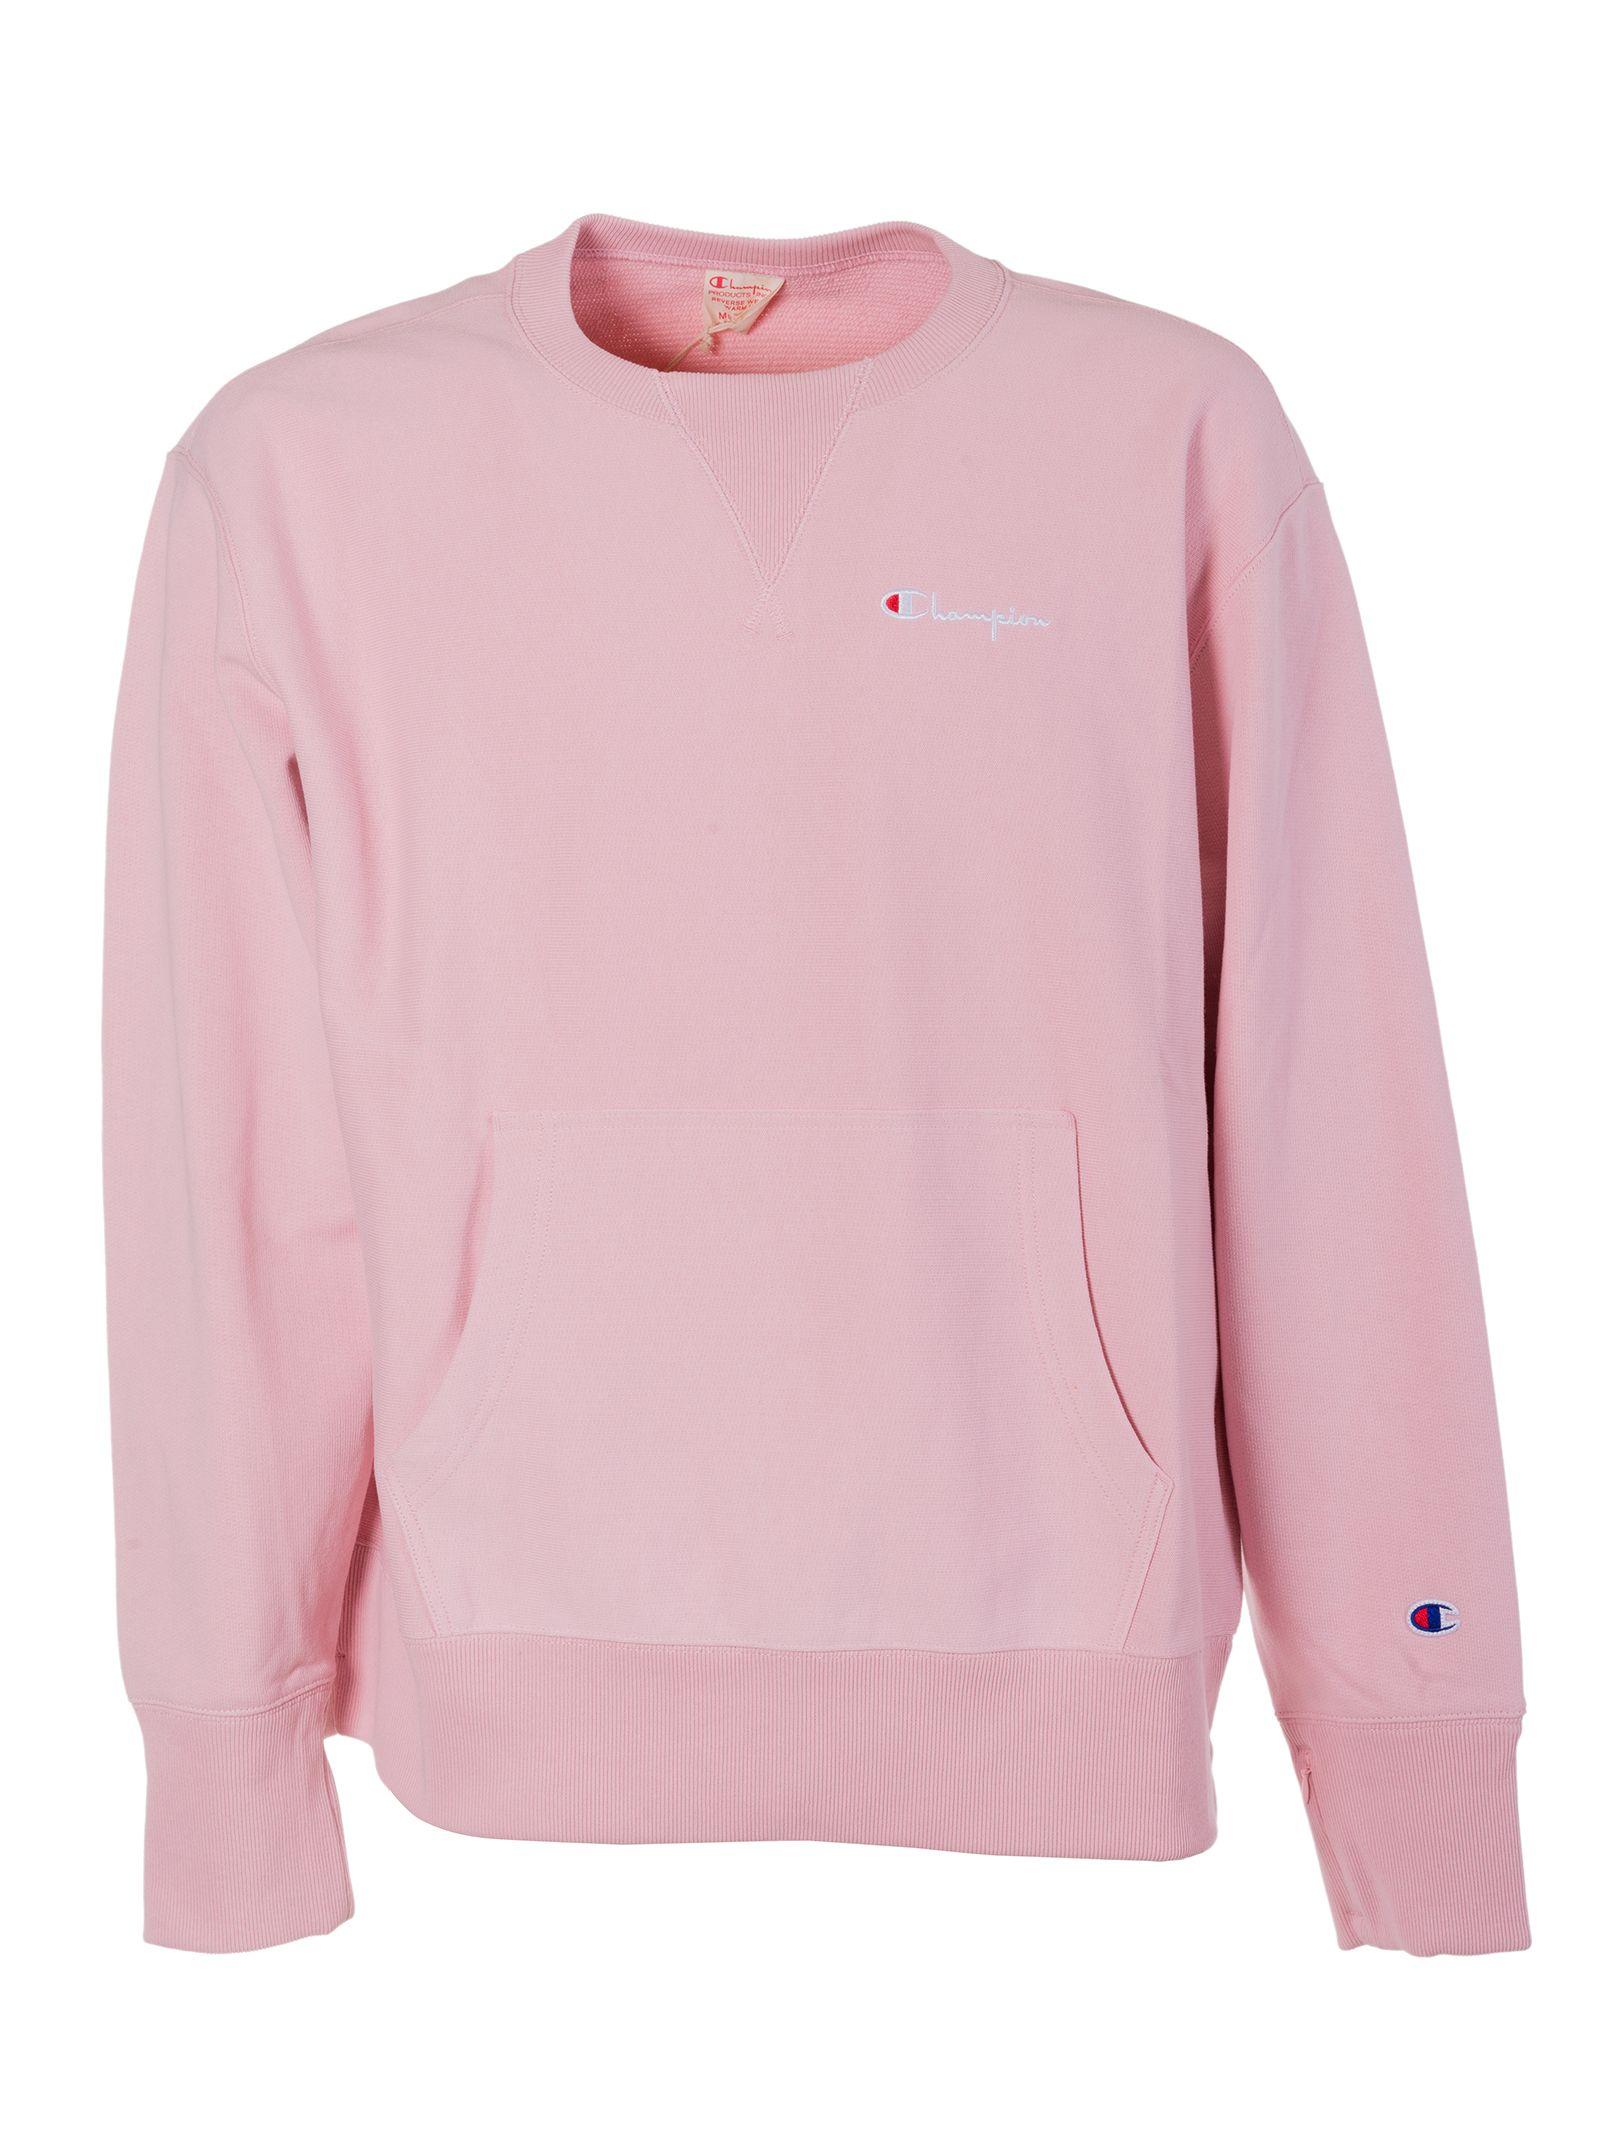 Champion Crewneck Champion Cloth Champion Crewneck Champion Clothing Pink Crewneck Sweatshirt [ 2136 x 1600 Pixel ]